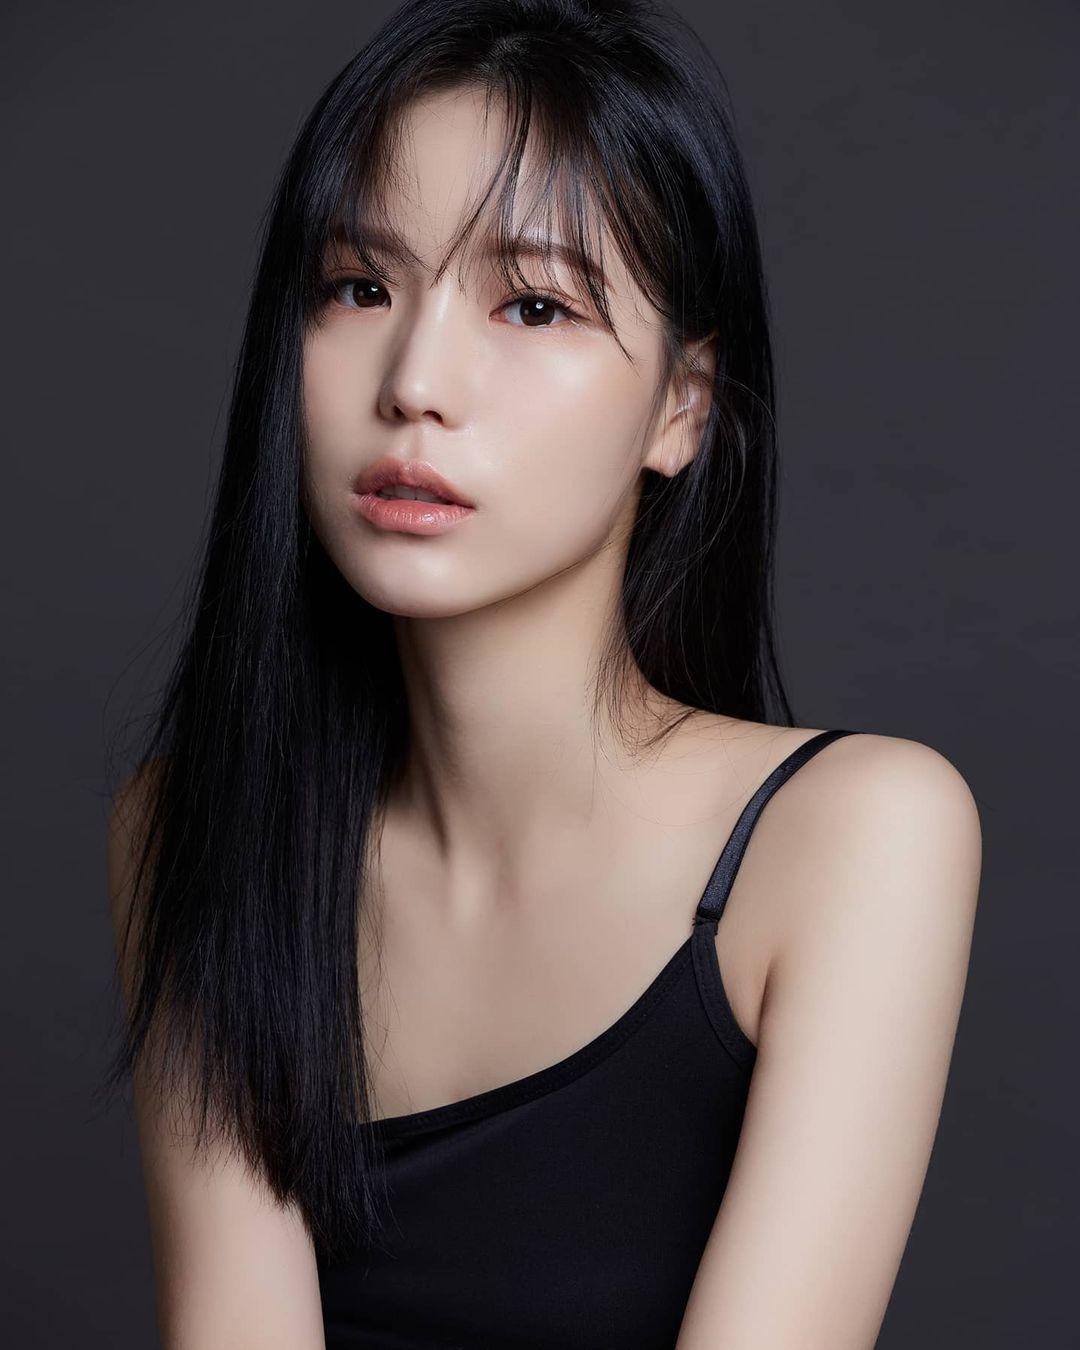 Kim Min Jung 민정 (jeoung2.2.2)